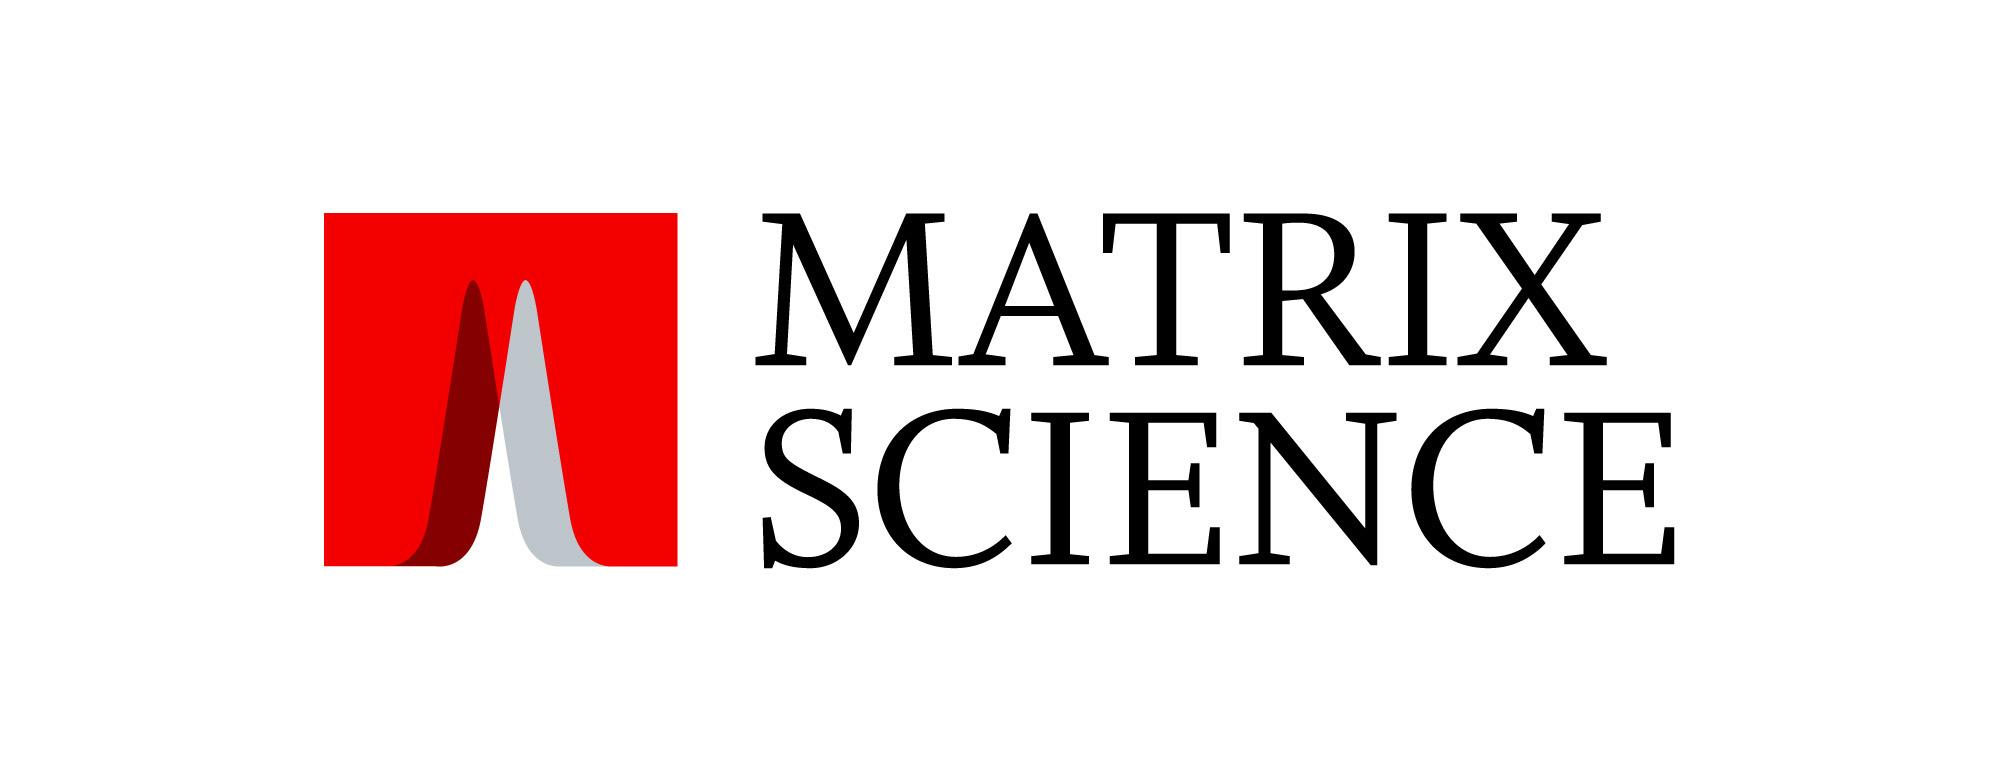 Matrix Science logo design